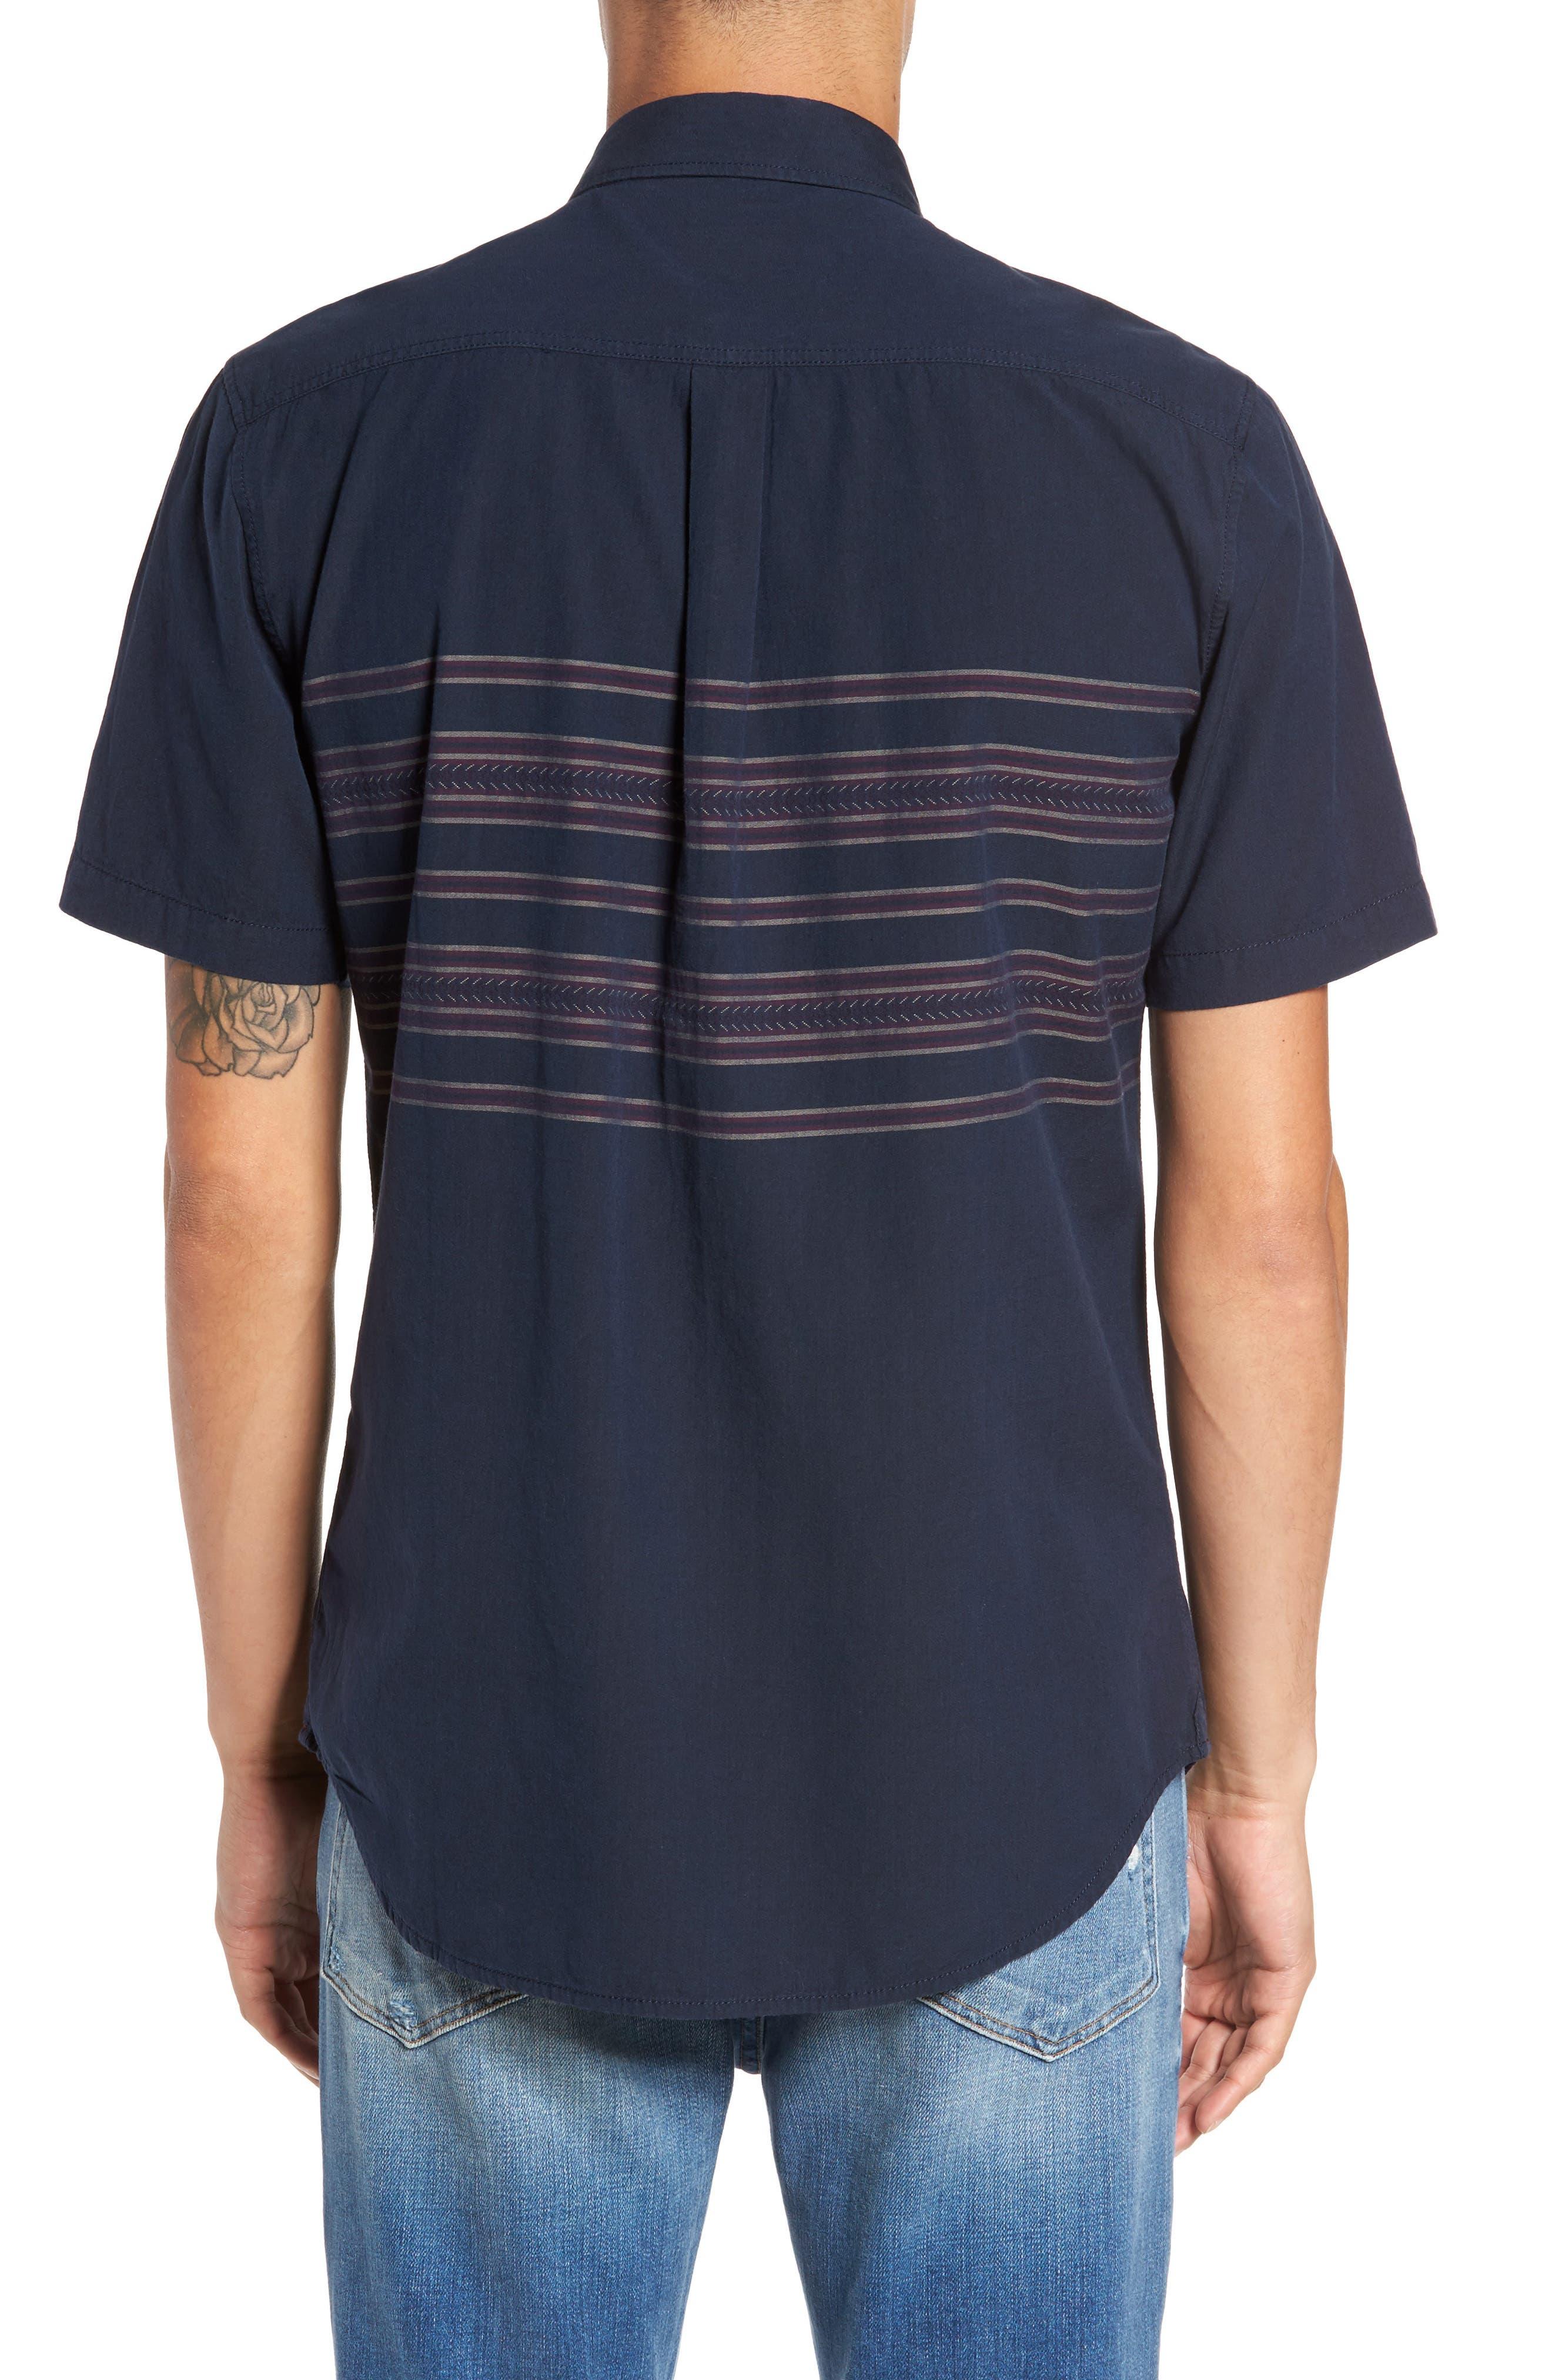 Alternate Image 2  - Vans Benmore Striped Woven Shirt